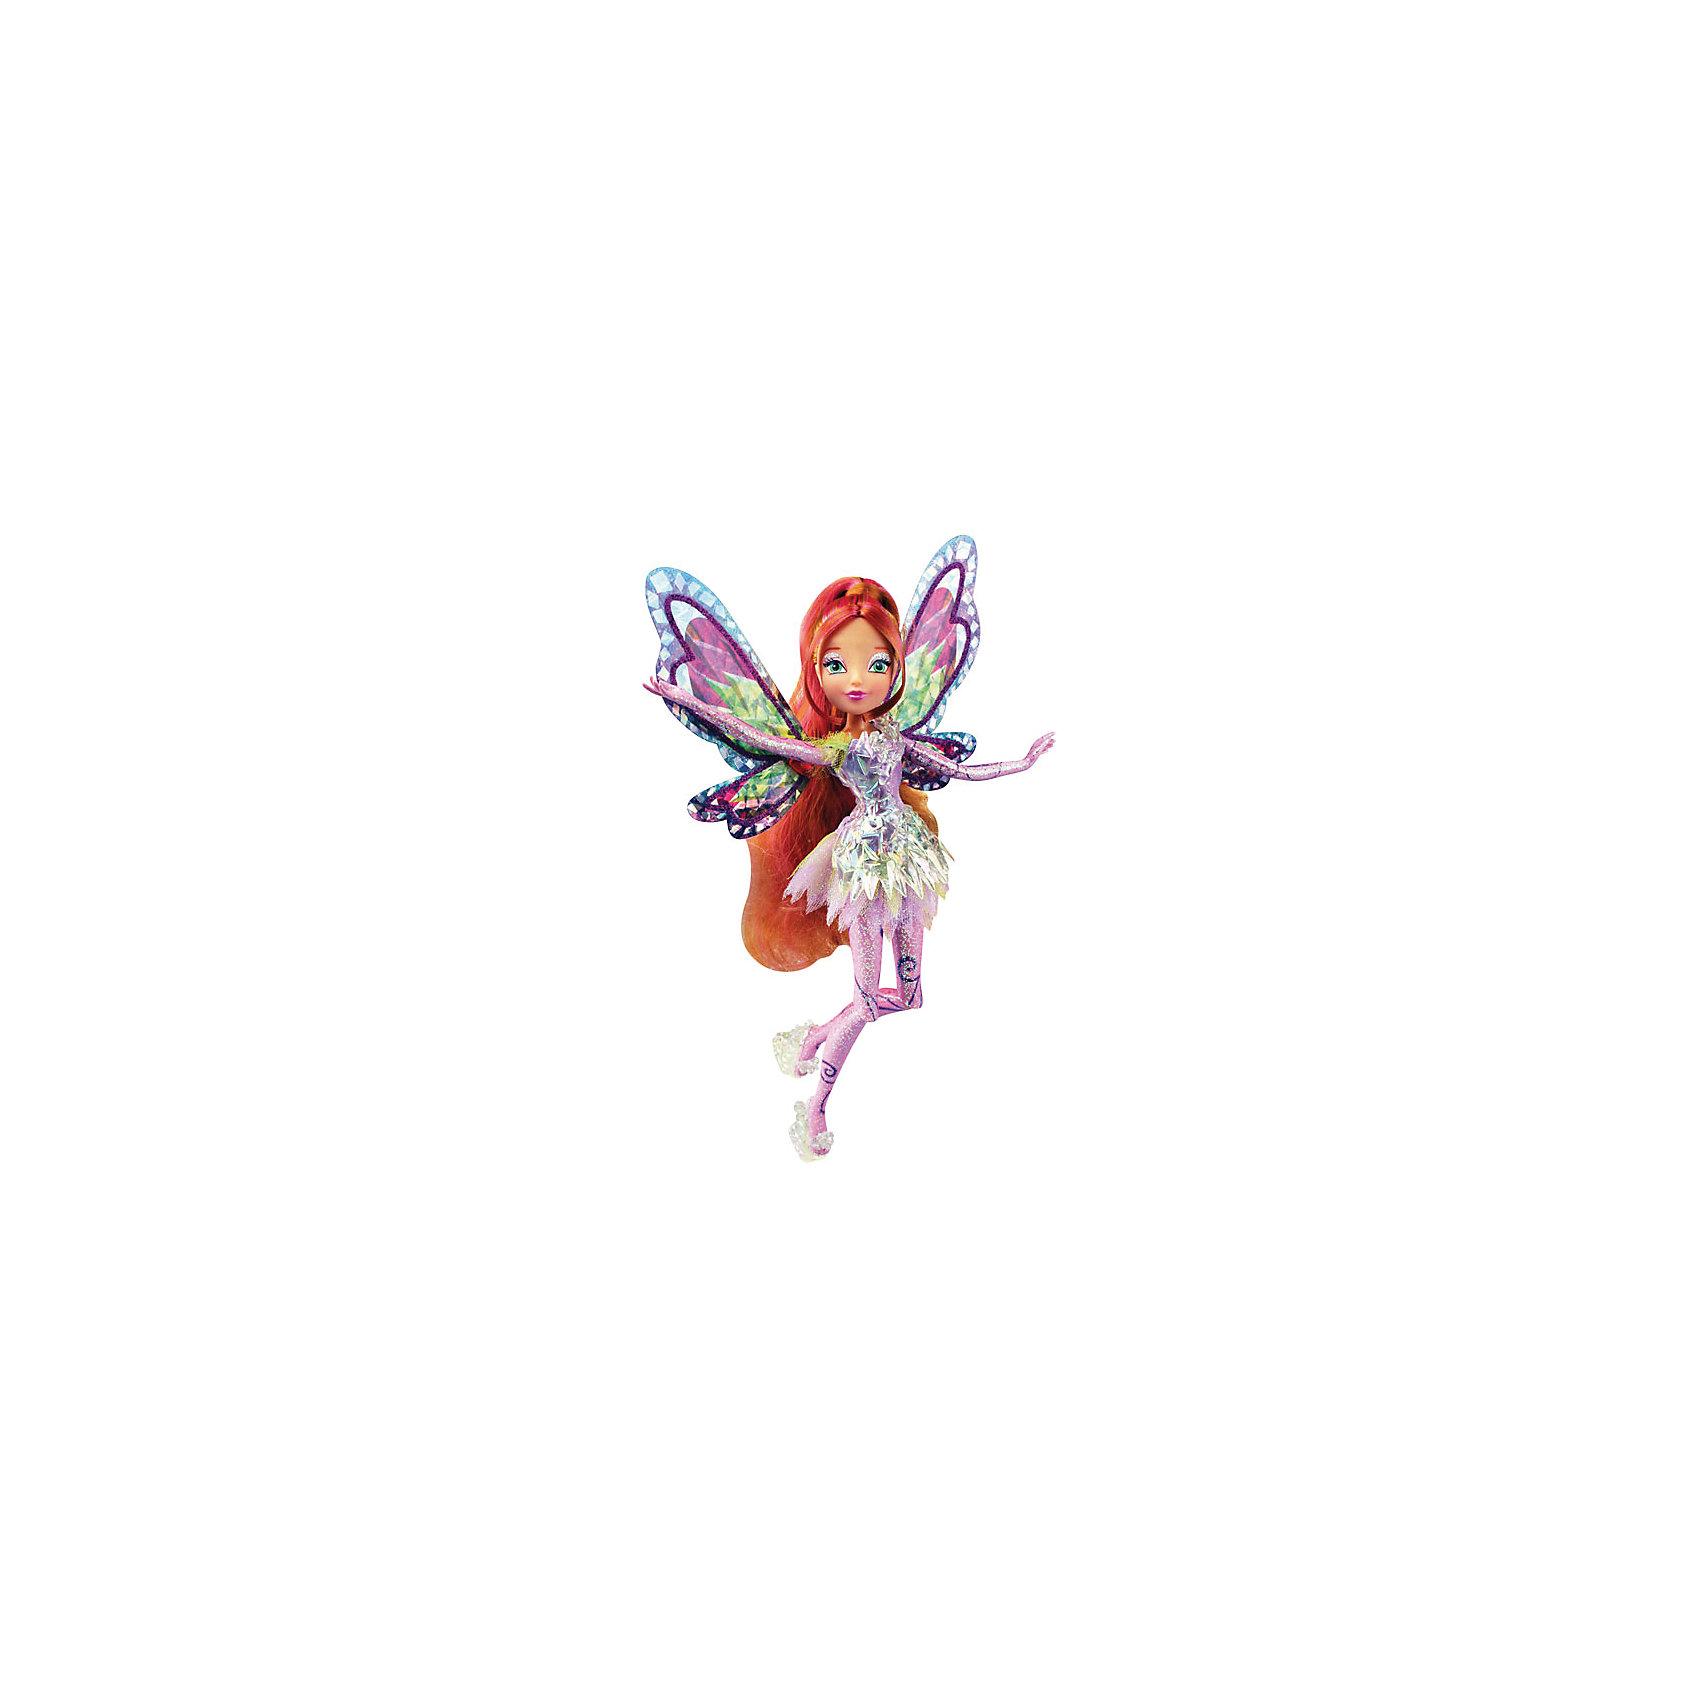 Gulliver Кукла Флора, Тайникс, Winx Club gulliver игровой набор блум волшебный трон winx club